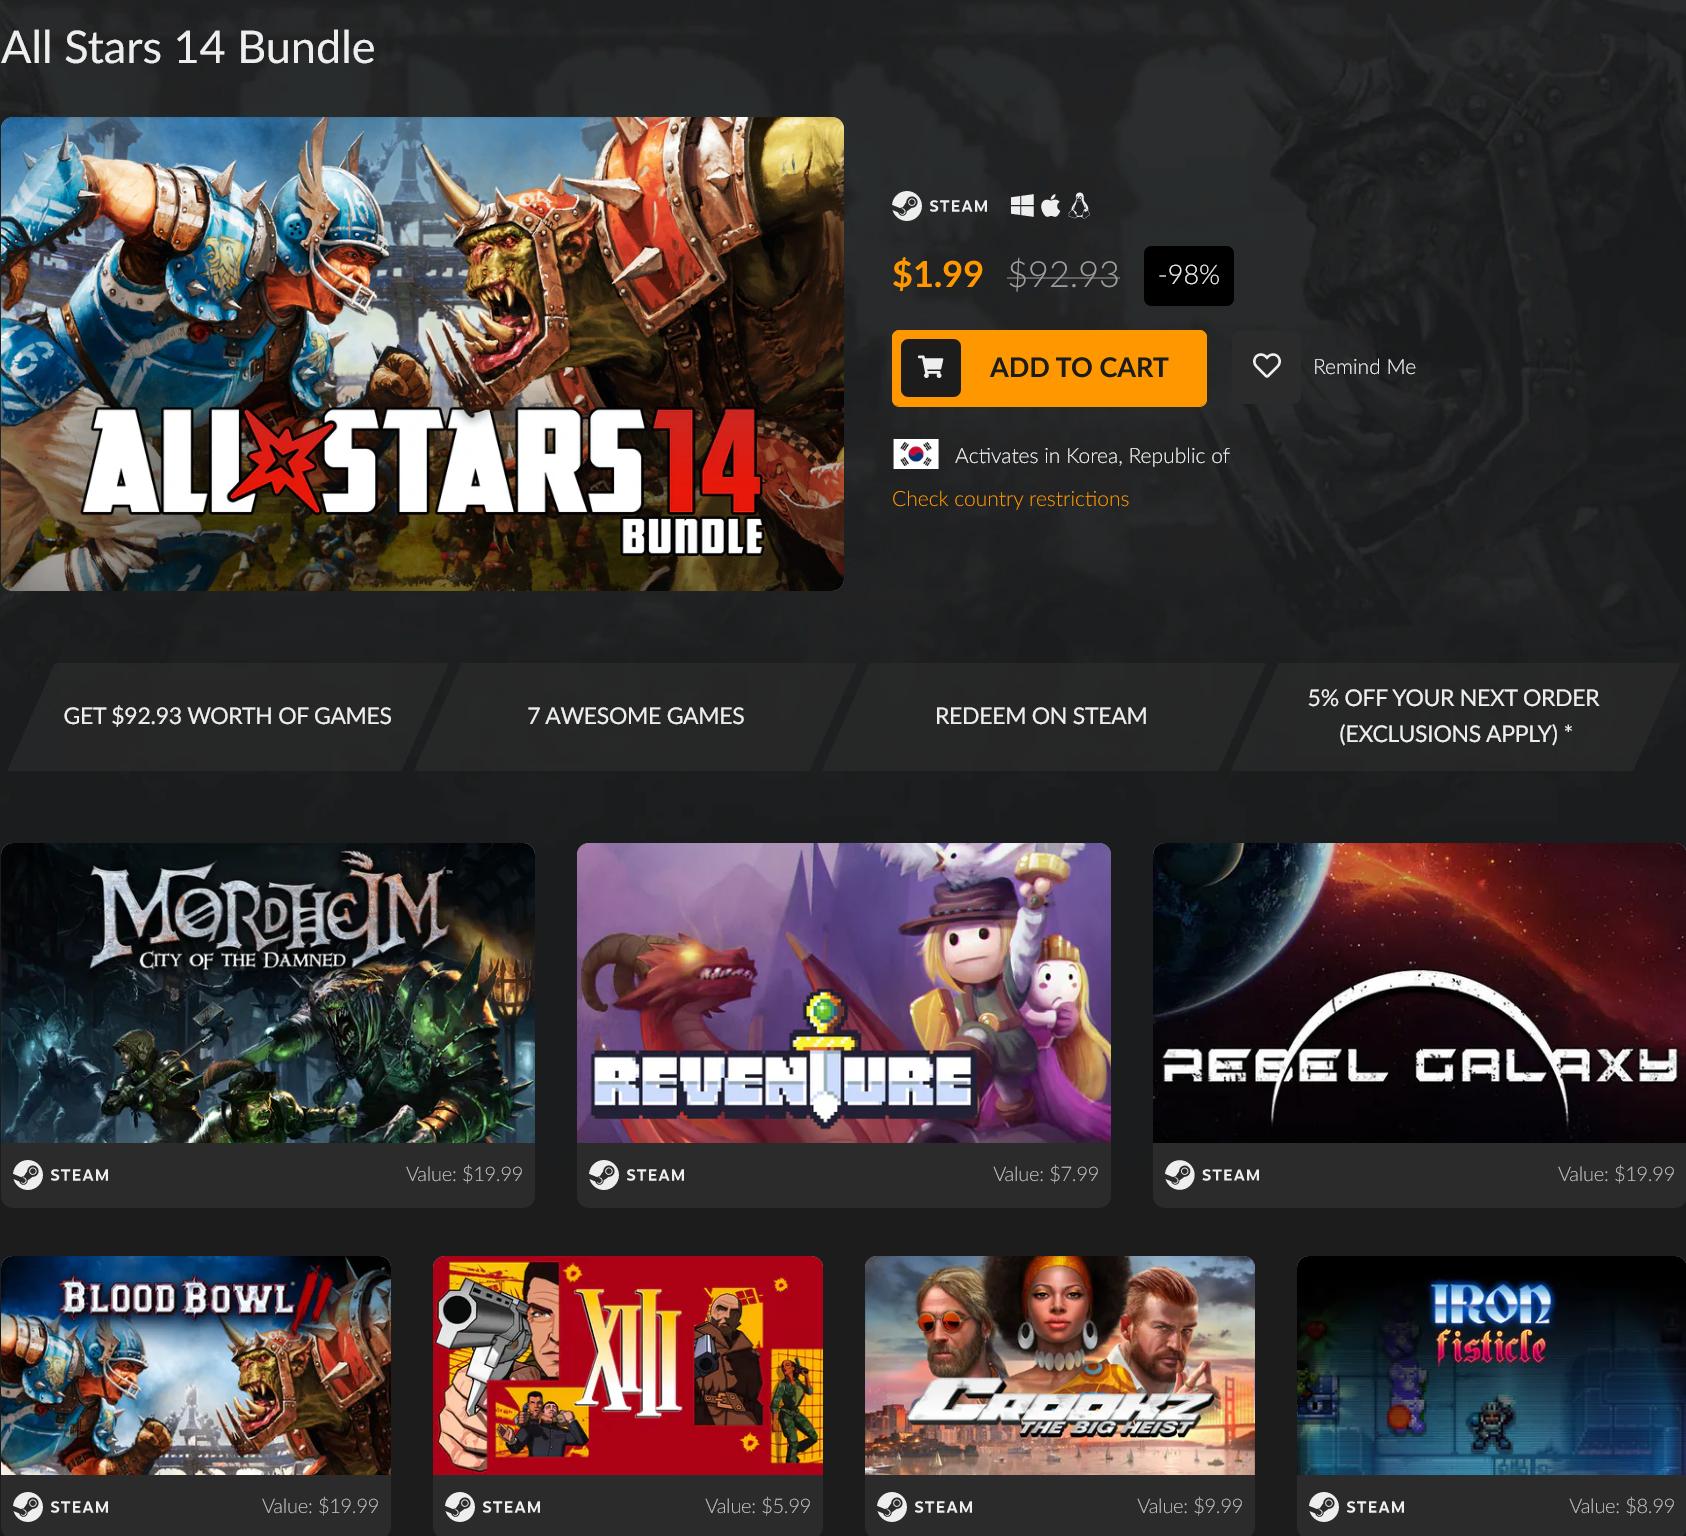 Screenshot 2021-07-17 at 00-26-51 All Stars 14 Bundle Steam Game Bundle Fanatical.png